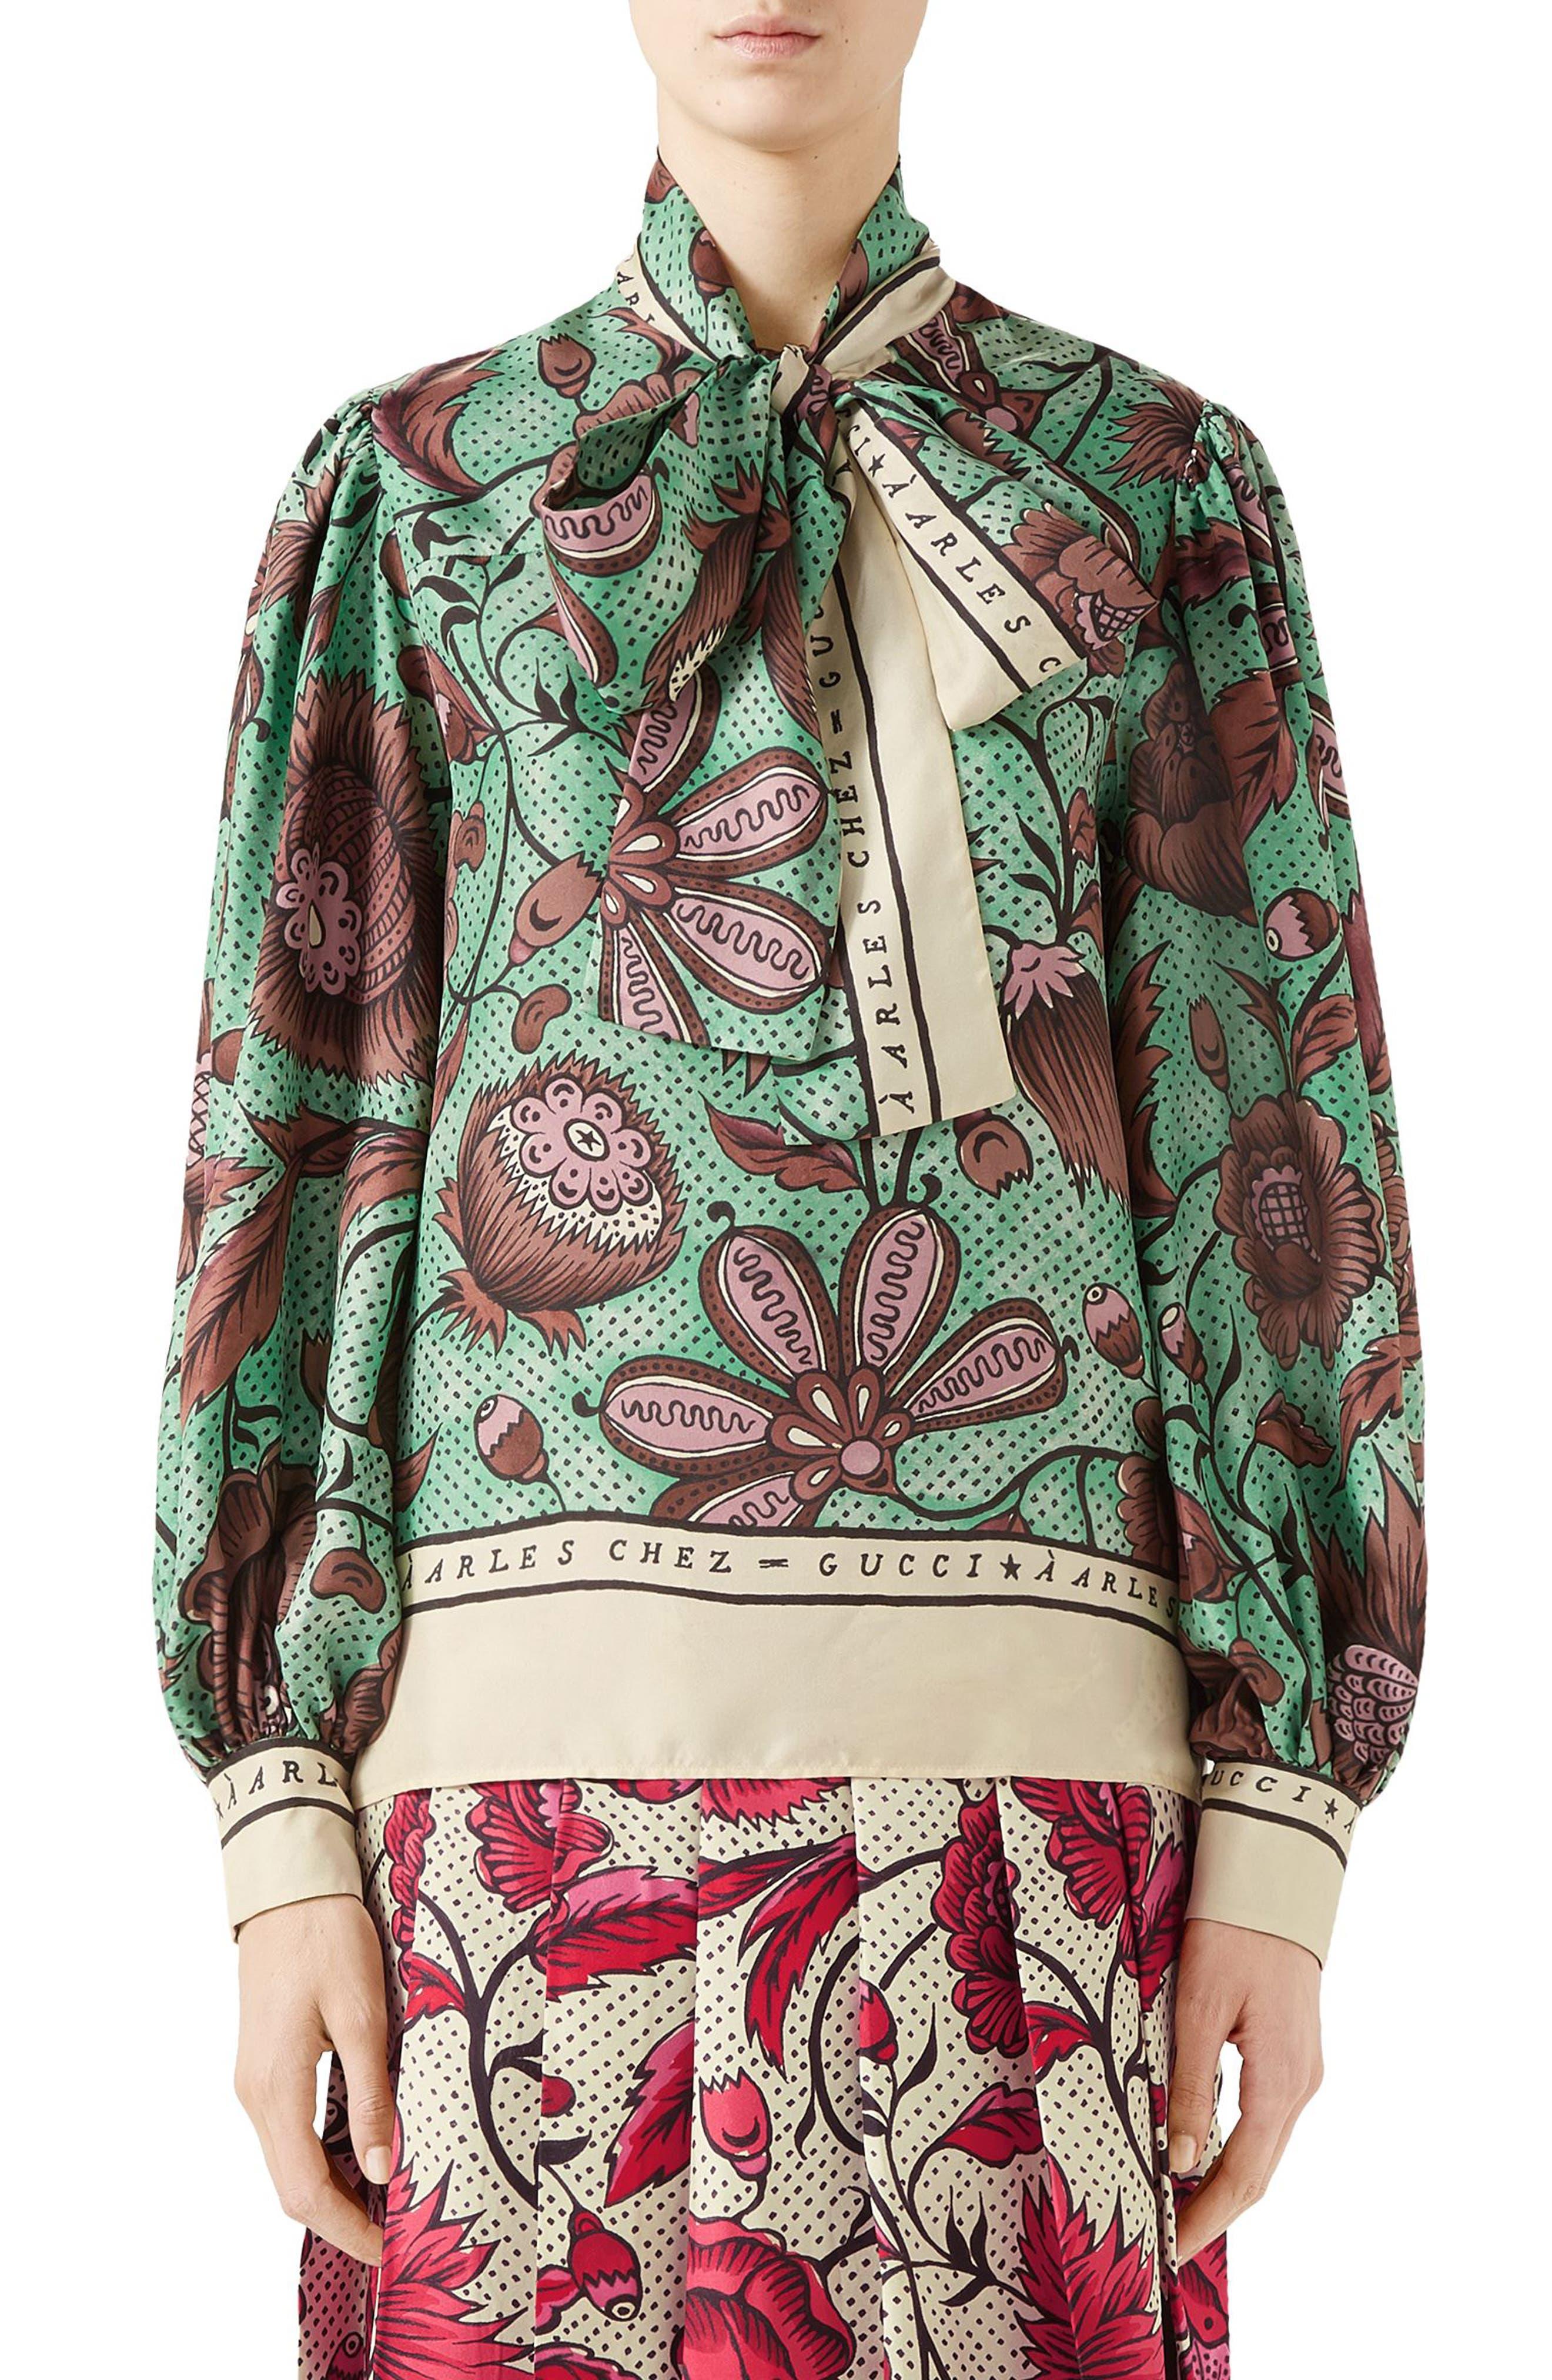 Watercolor Floral Print Tie Neck Silk Blouse,                         Main,                         color, 2125 BROWN/ GREEN PRINTED